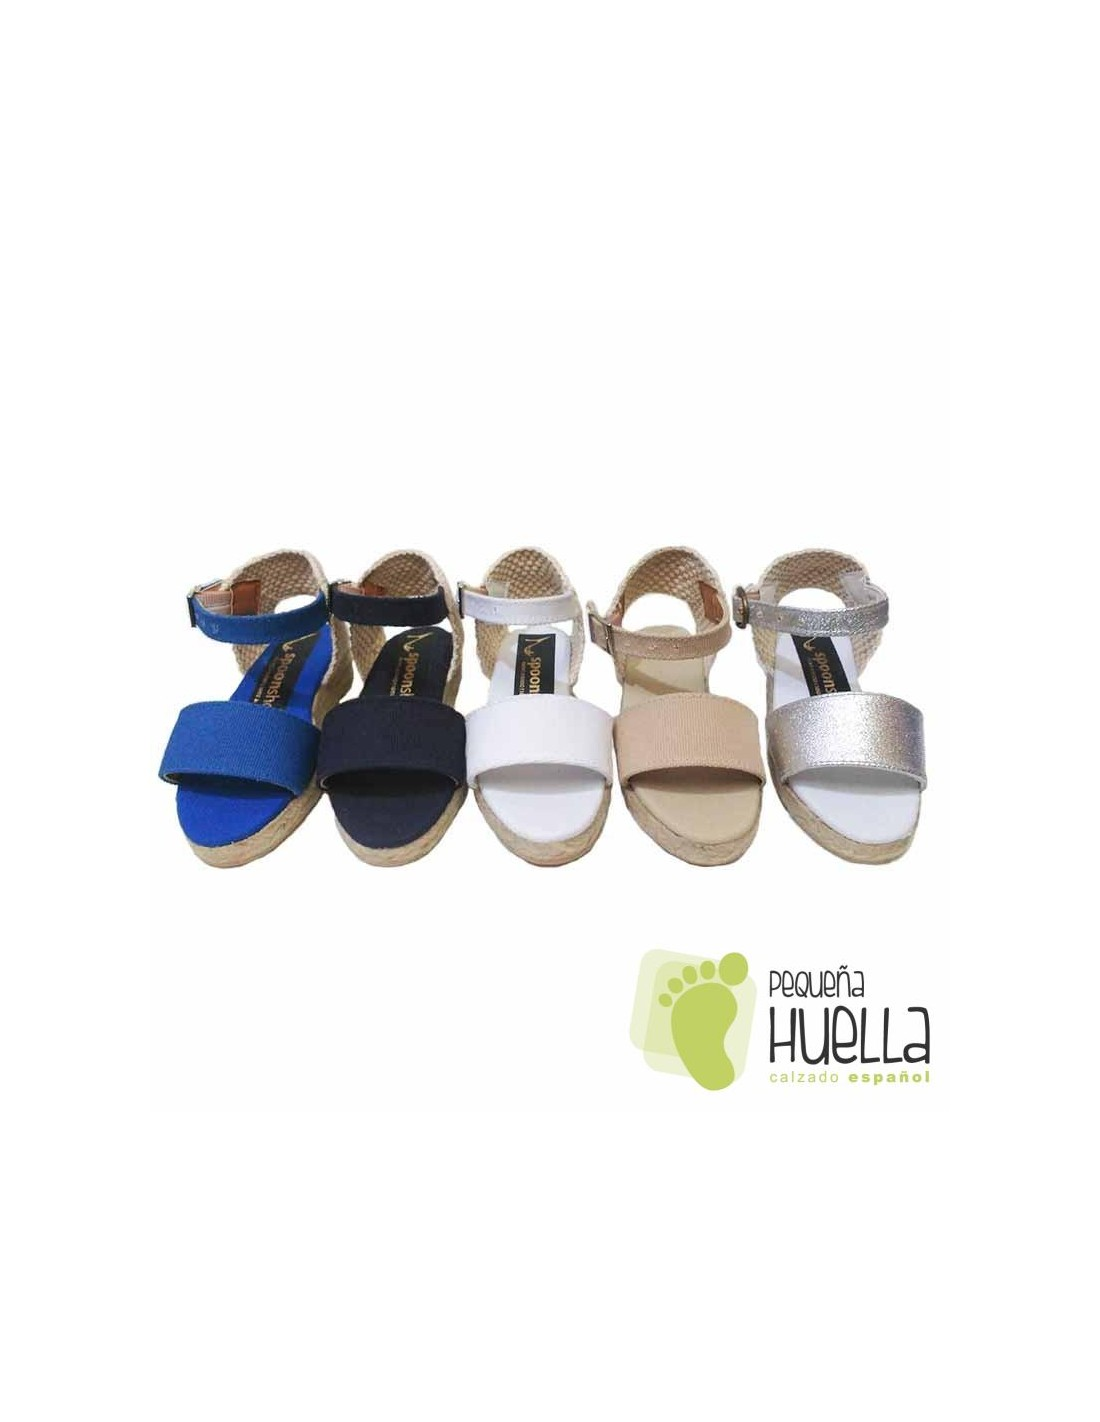 6d693e306 Comprar alpargatas tipo sandalias con cuña de yute para niña y mujer